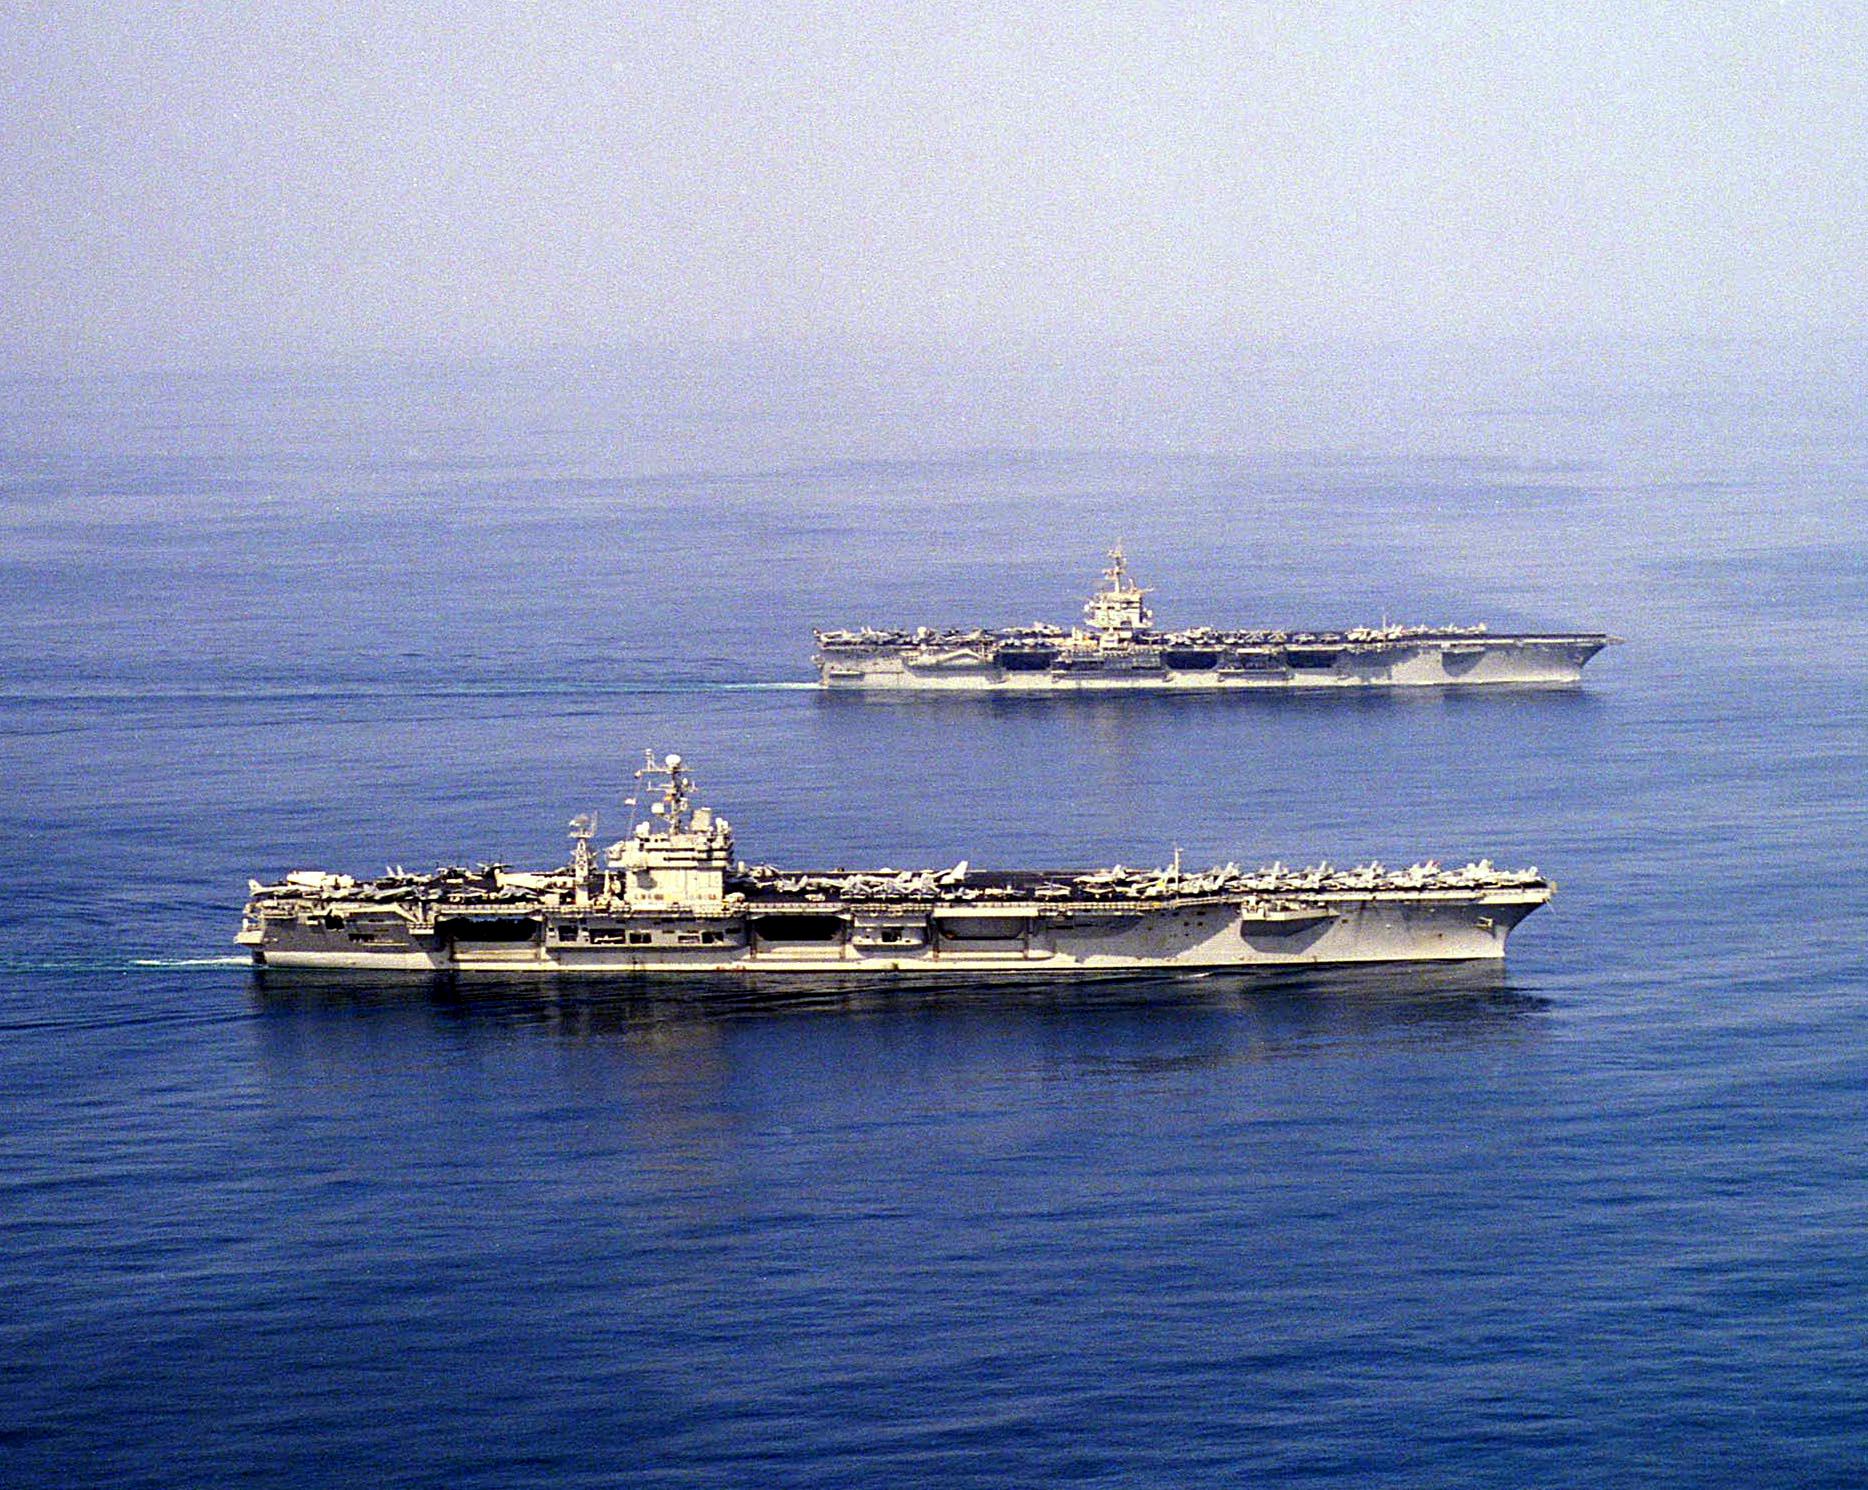 Uss Enterprise (cvn 65) & Uss Carl Vinson (cvn 70).